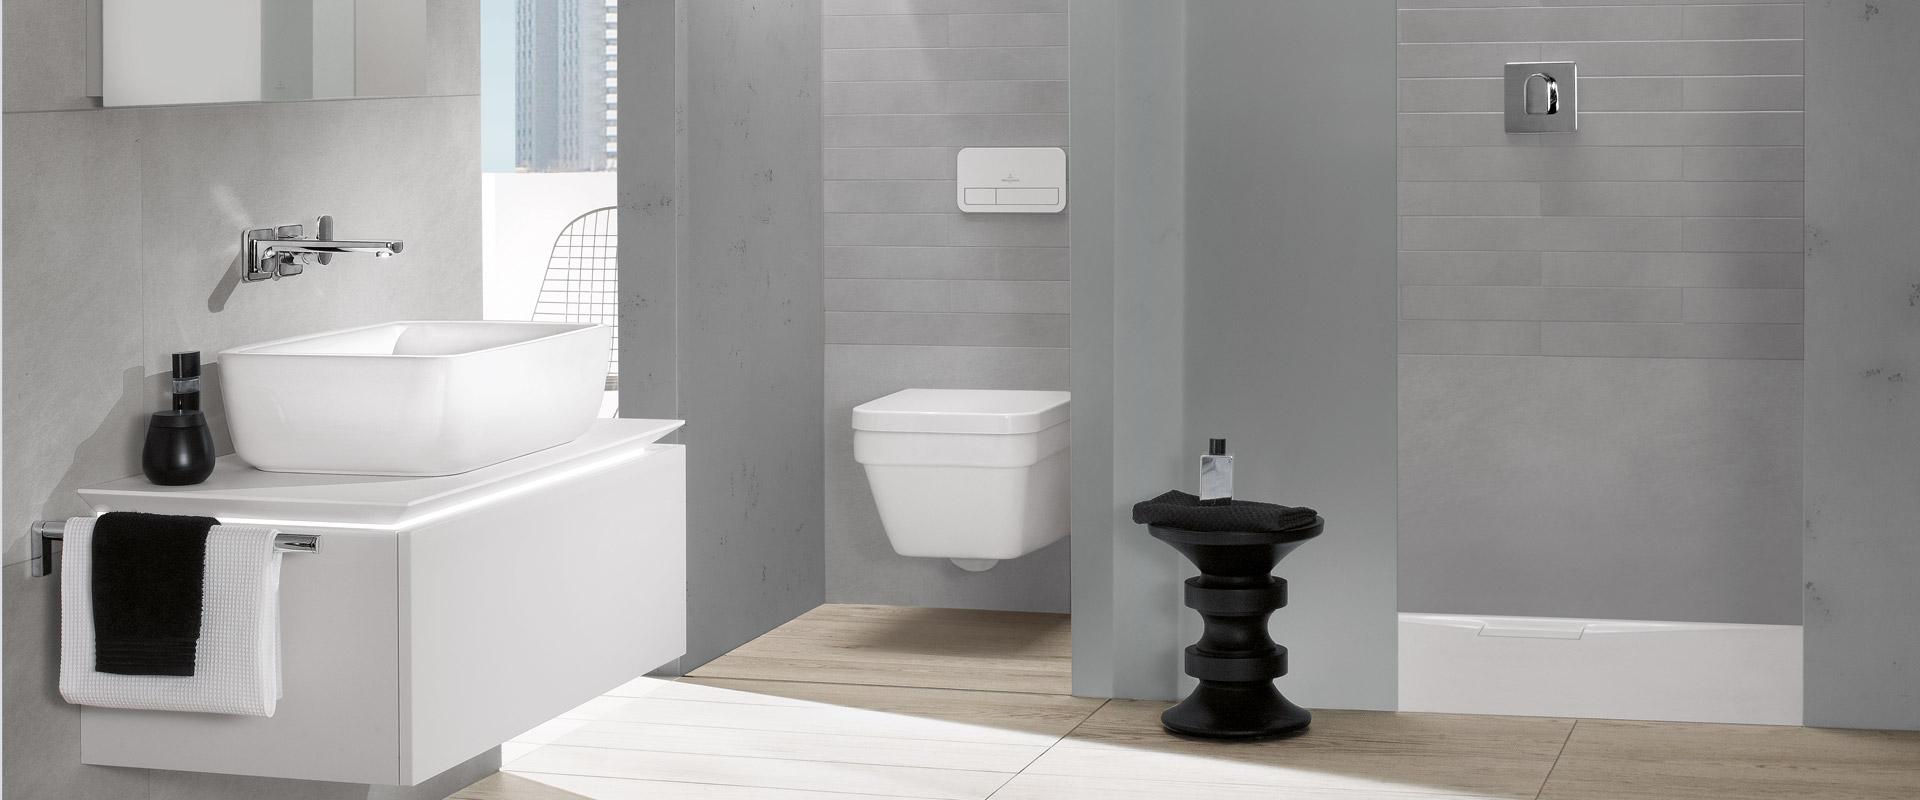 Architectura-collectie - Tijdloos design - Villeroy & Boch